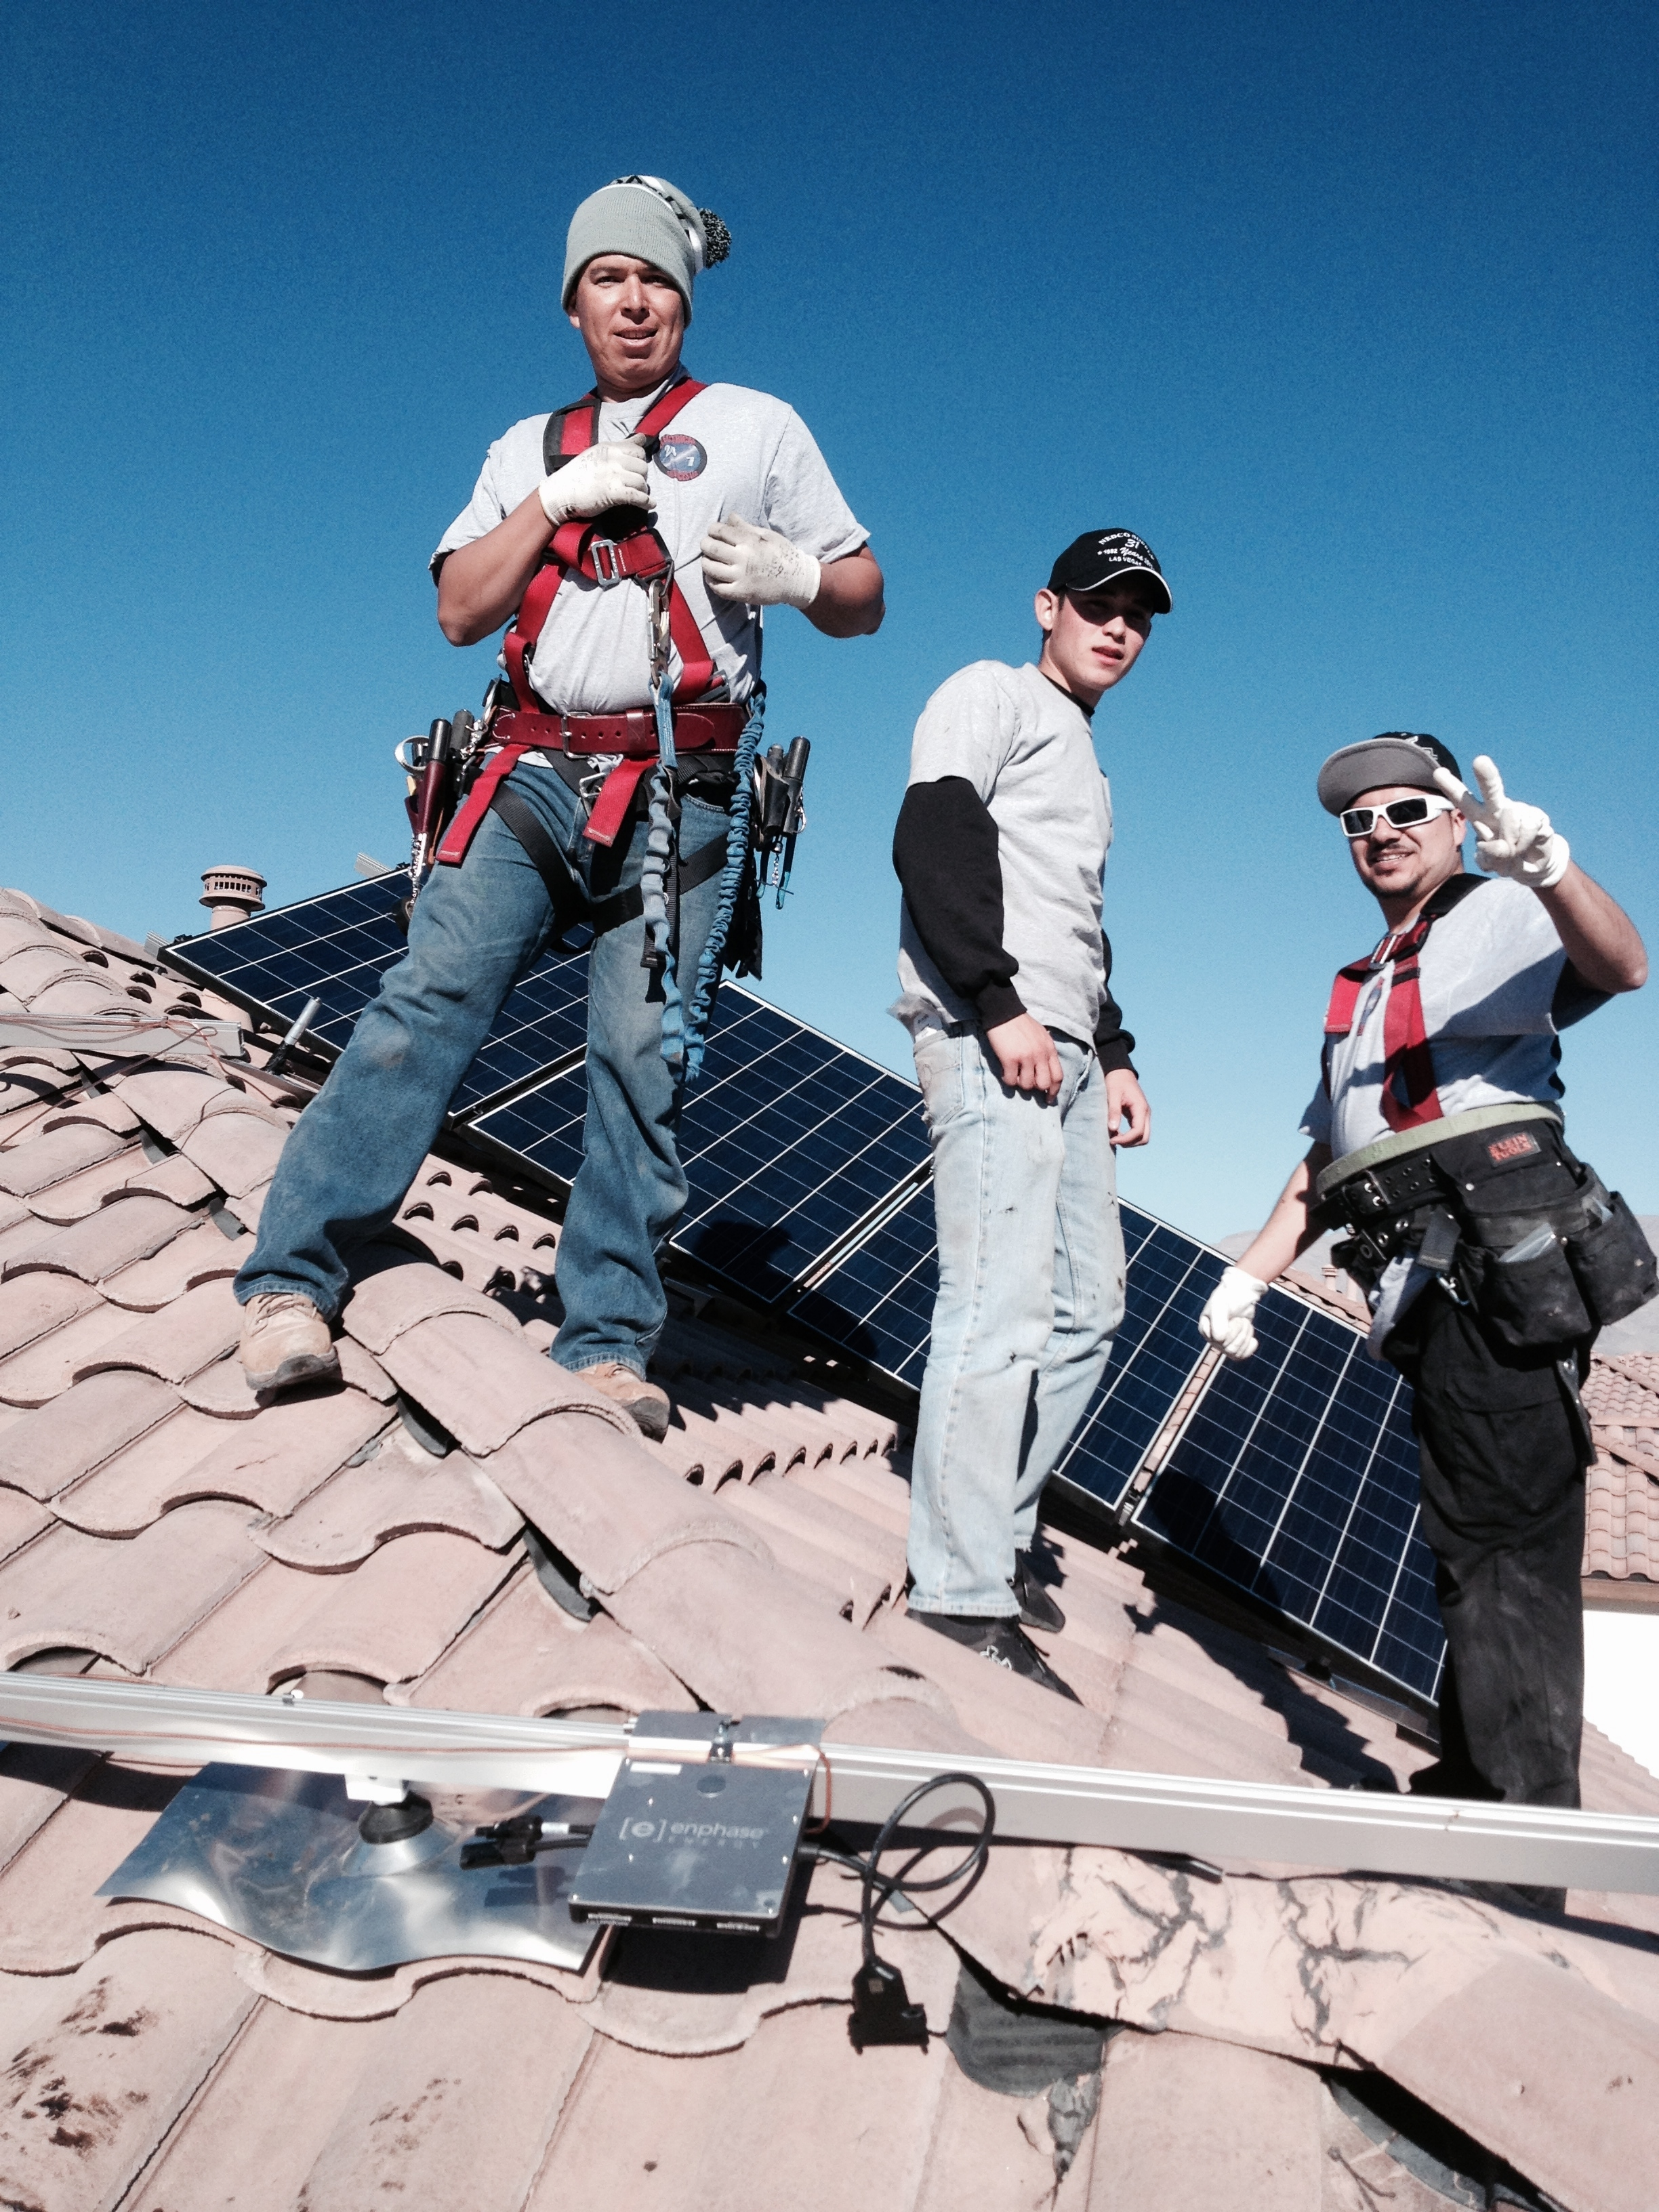 24 7 Electrical Services Llc Las Vegas Nv Company